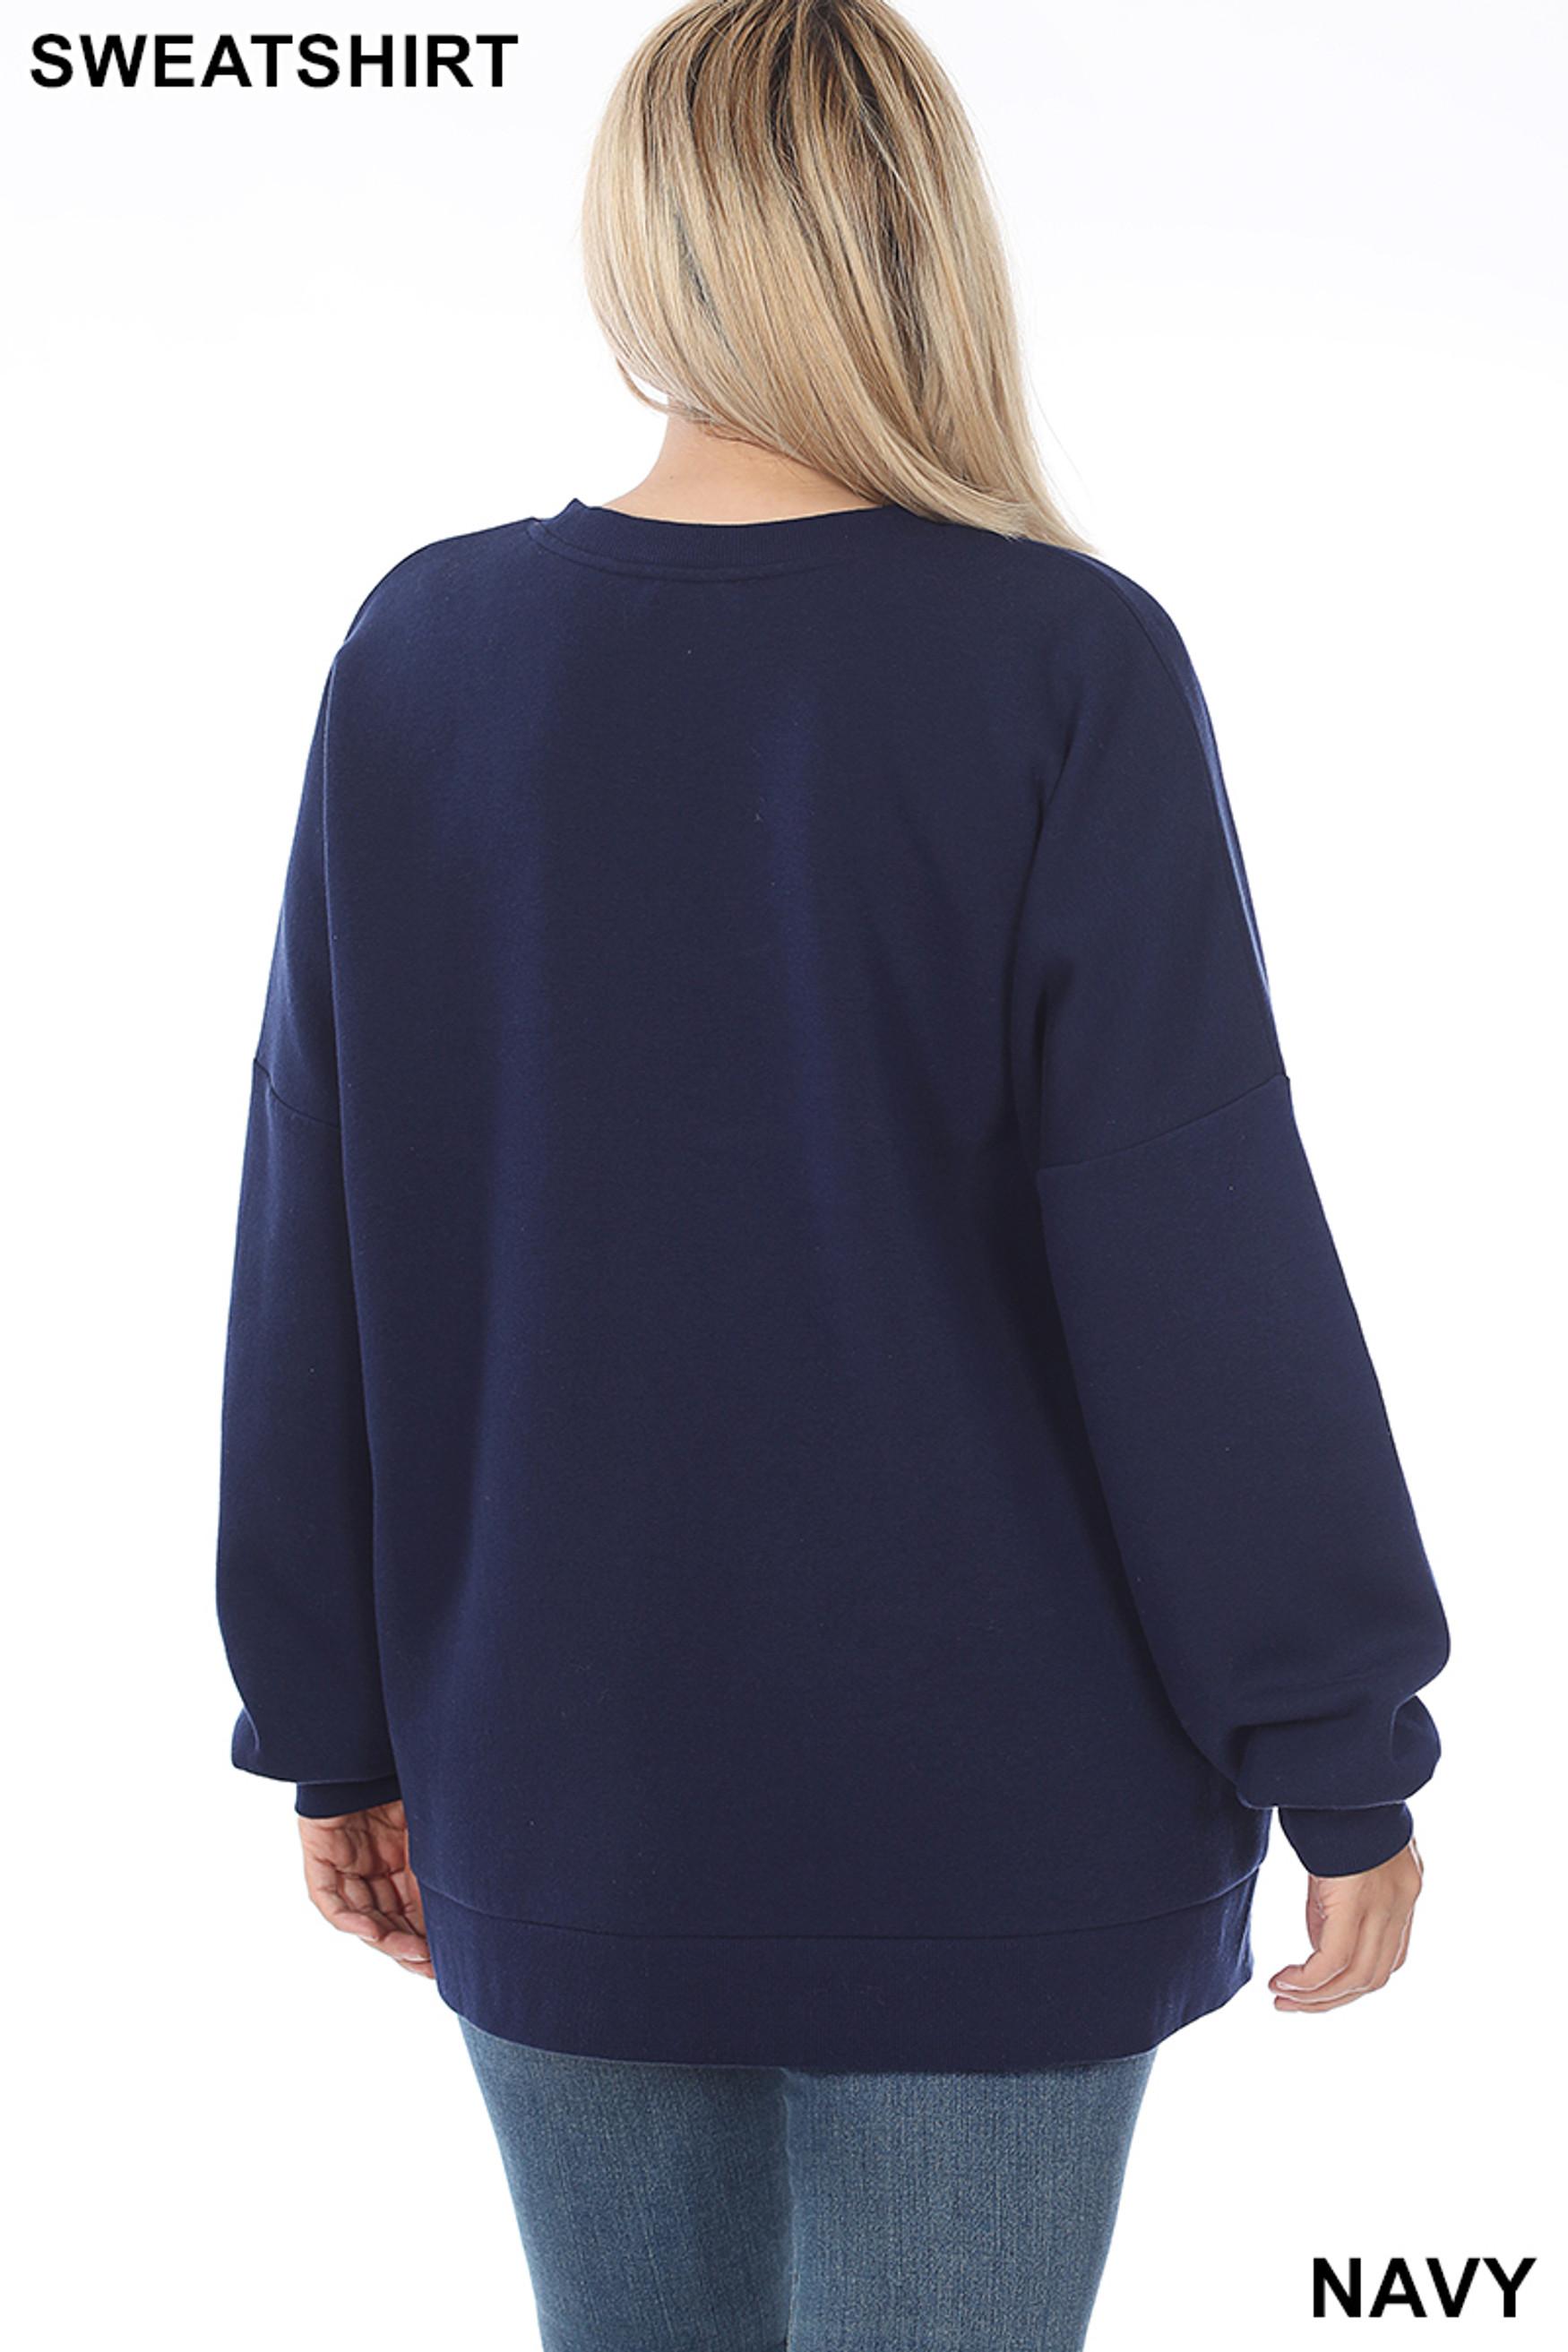 Back view of Navy Round Neck Hi-Low Hem Plus Size Sweatshirt